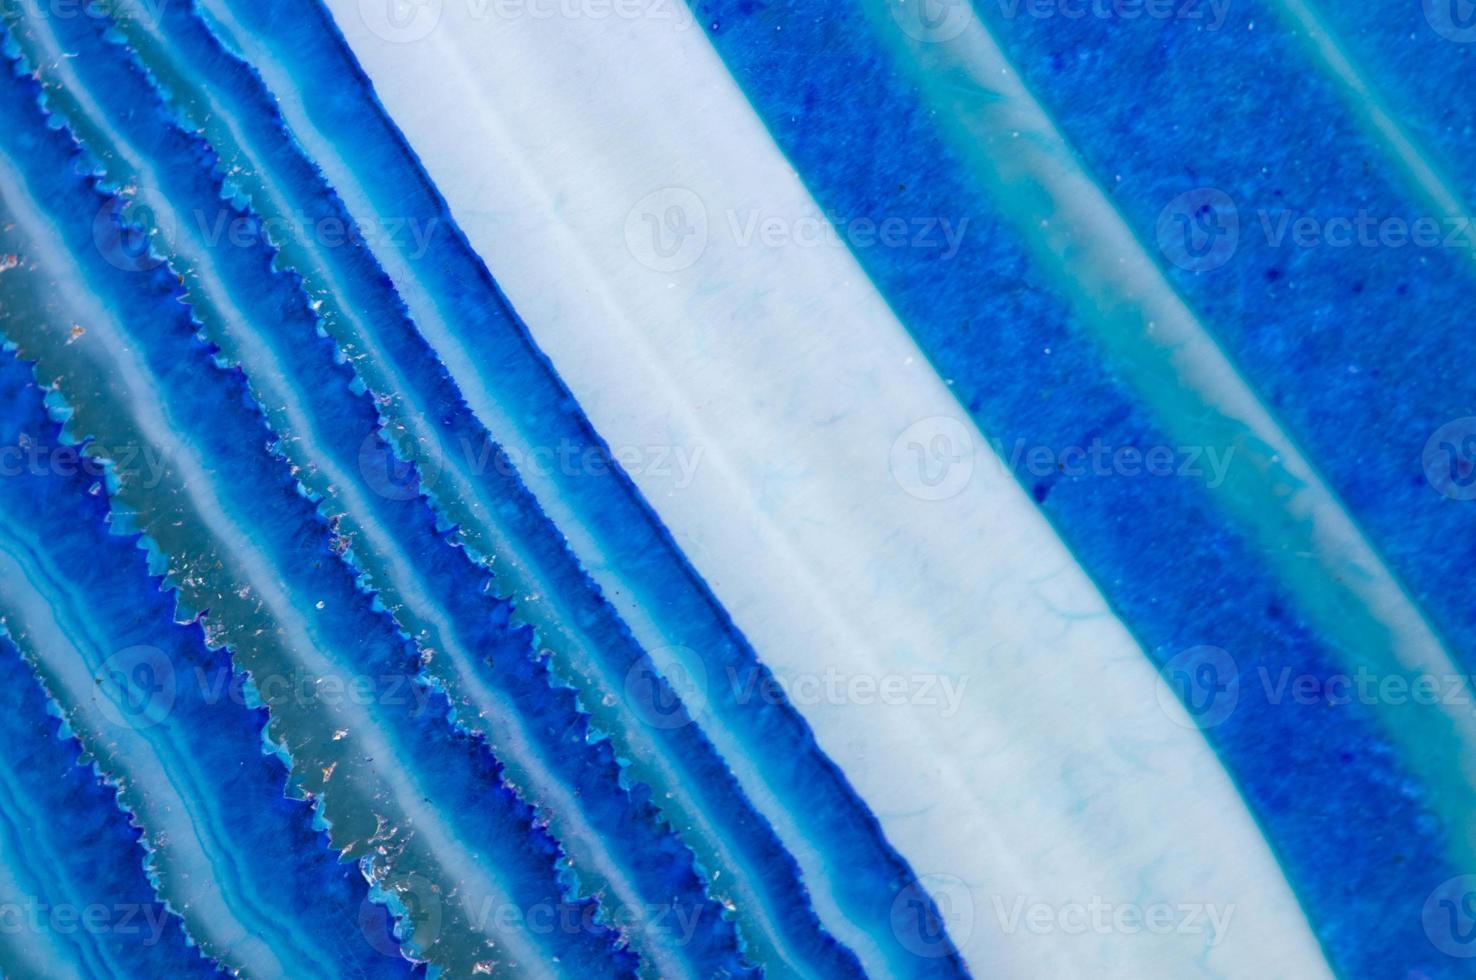 onyx bleu cristal. macro. photo